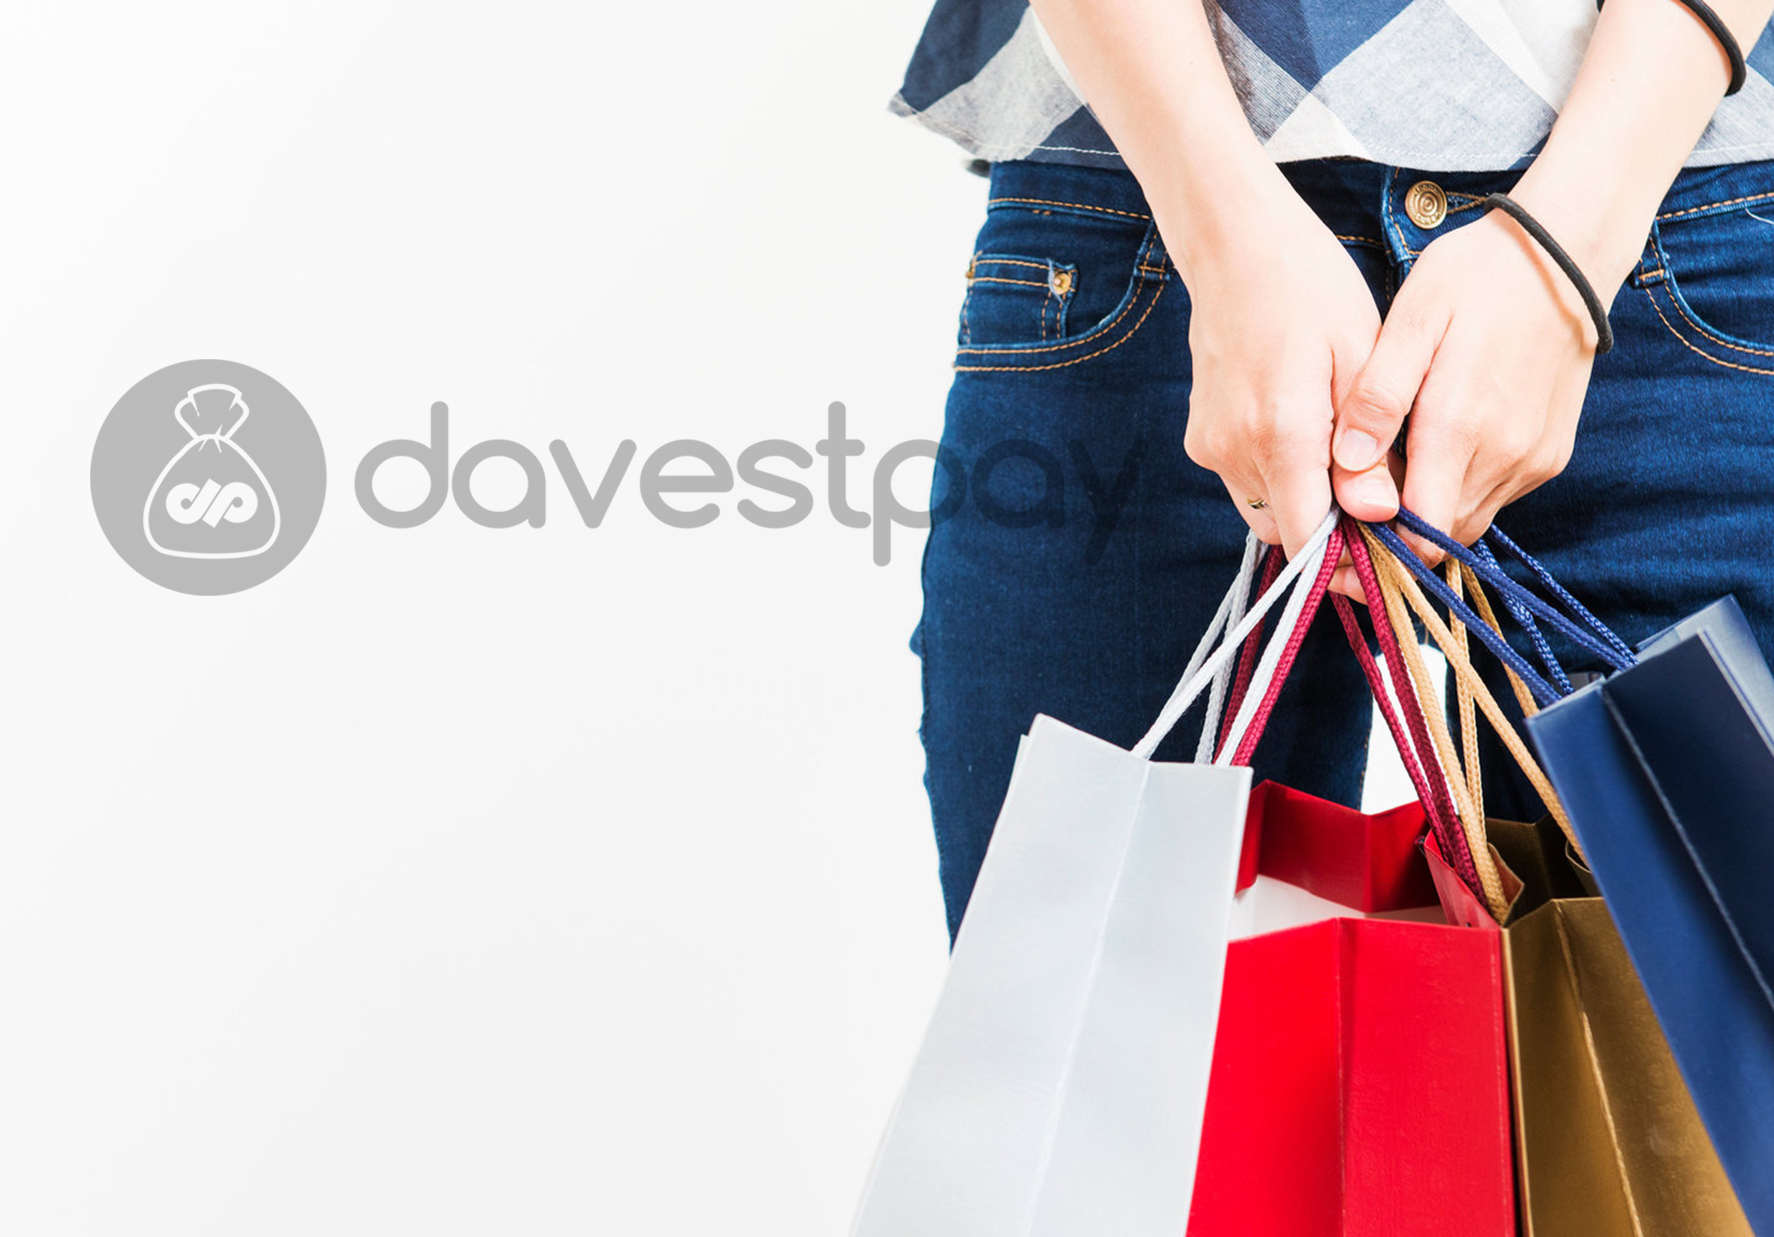 Coba Peluang Usaha Ini, Jika Senang Belanja